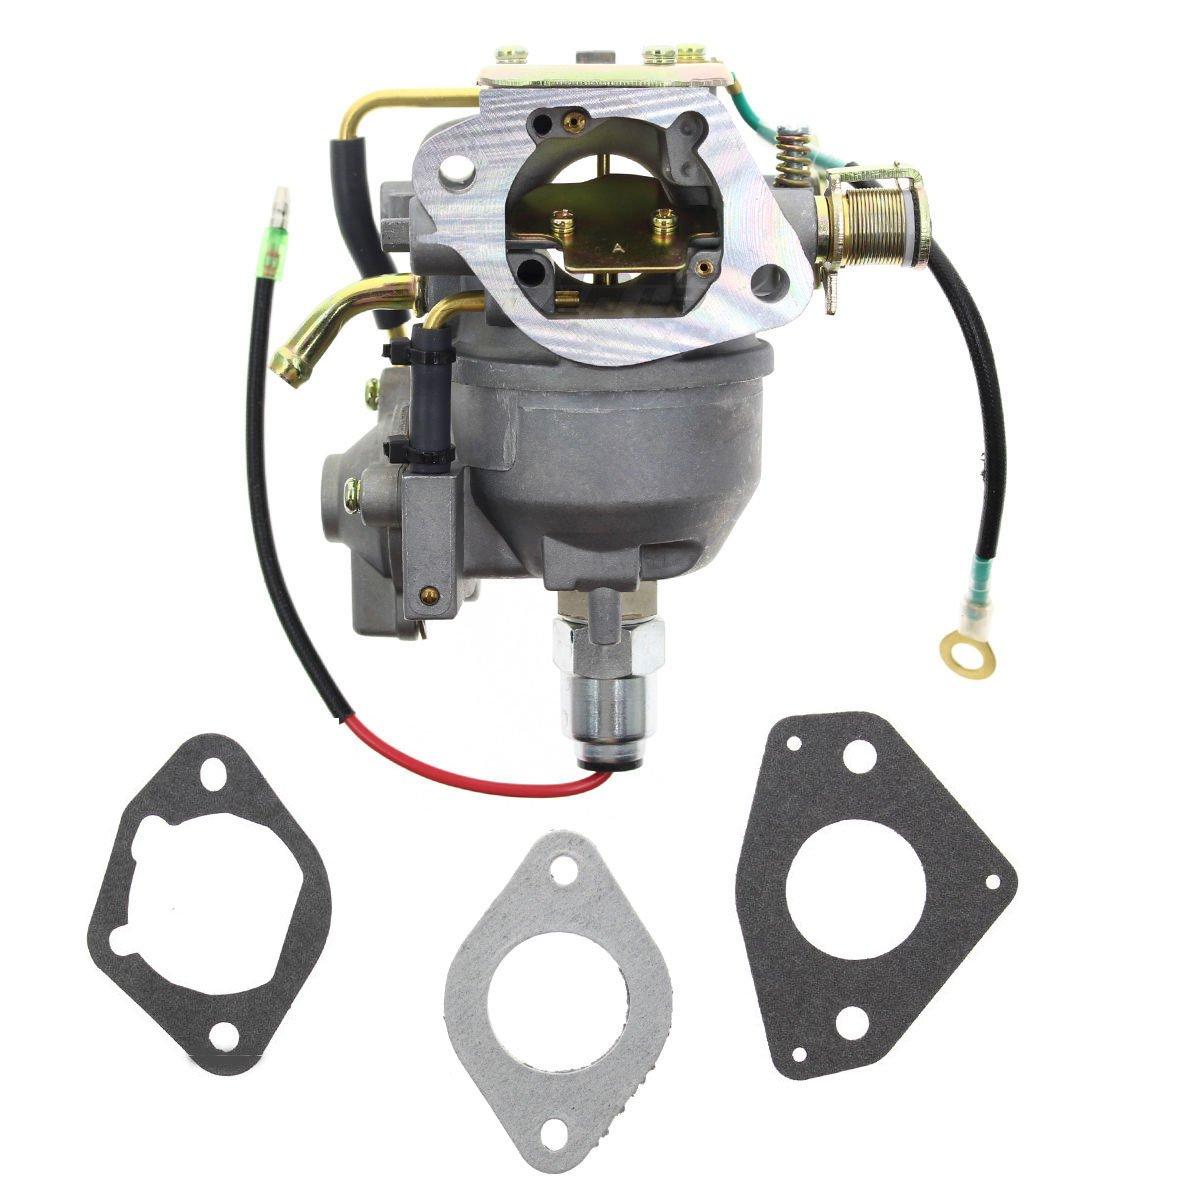 Amazon.com : New Carburetor For Kohler Engine 25 & 27 hp CV730 & CV740  24-853-102-S : Garden & Outdoor